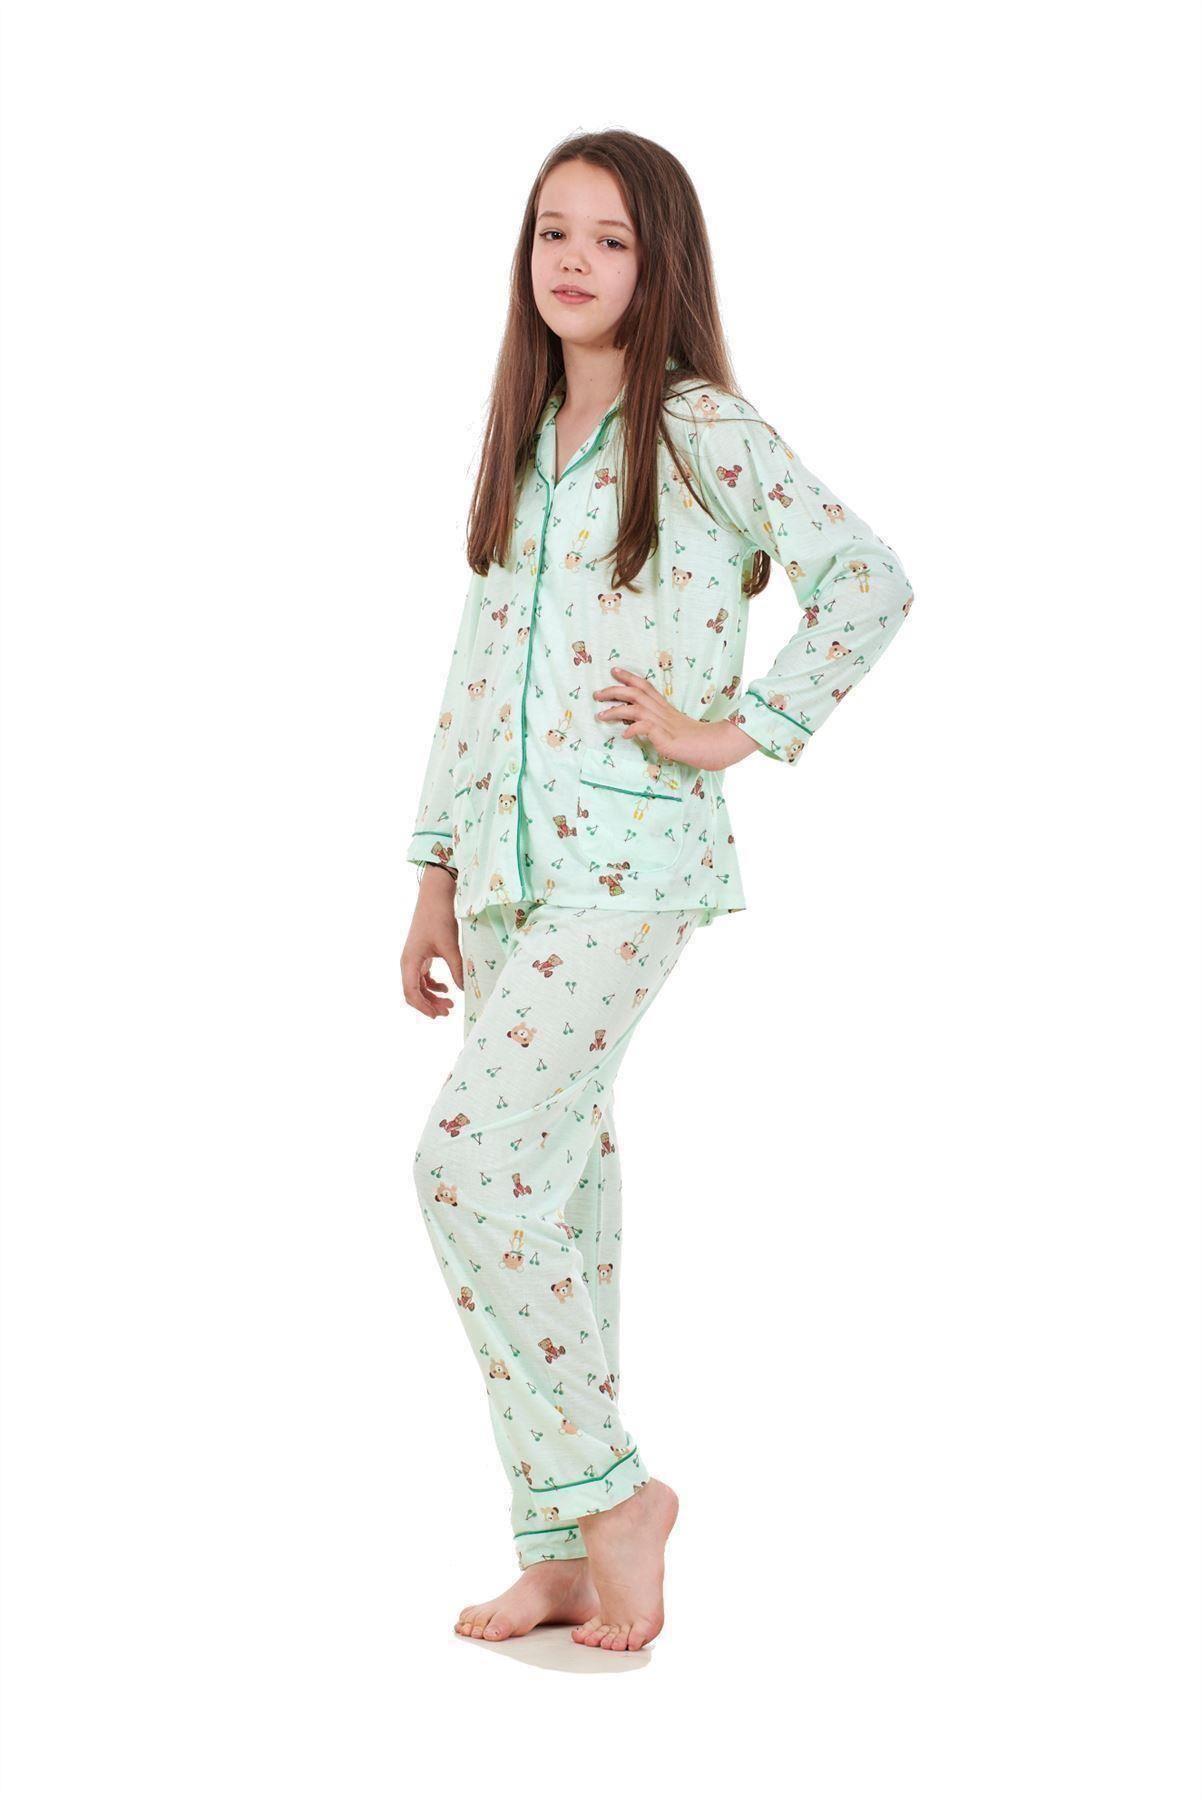 Teddy Long Girls Pyjamas w18 18-24 Months Pink